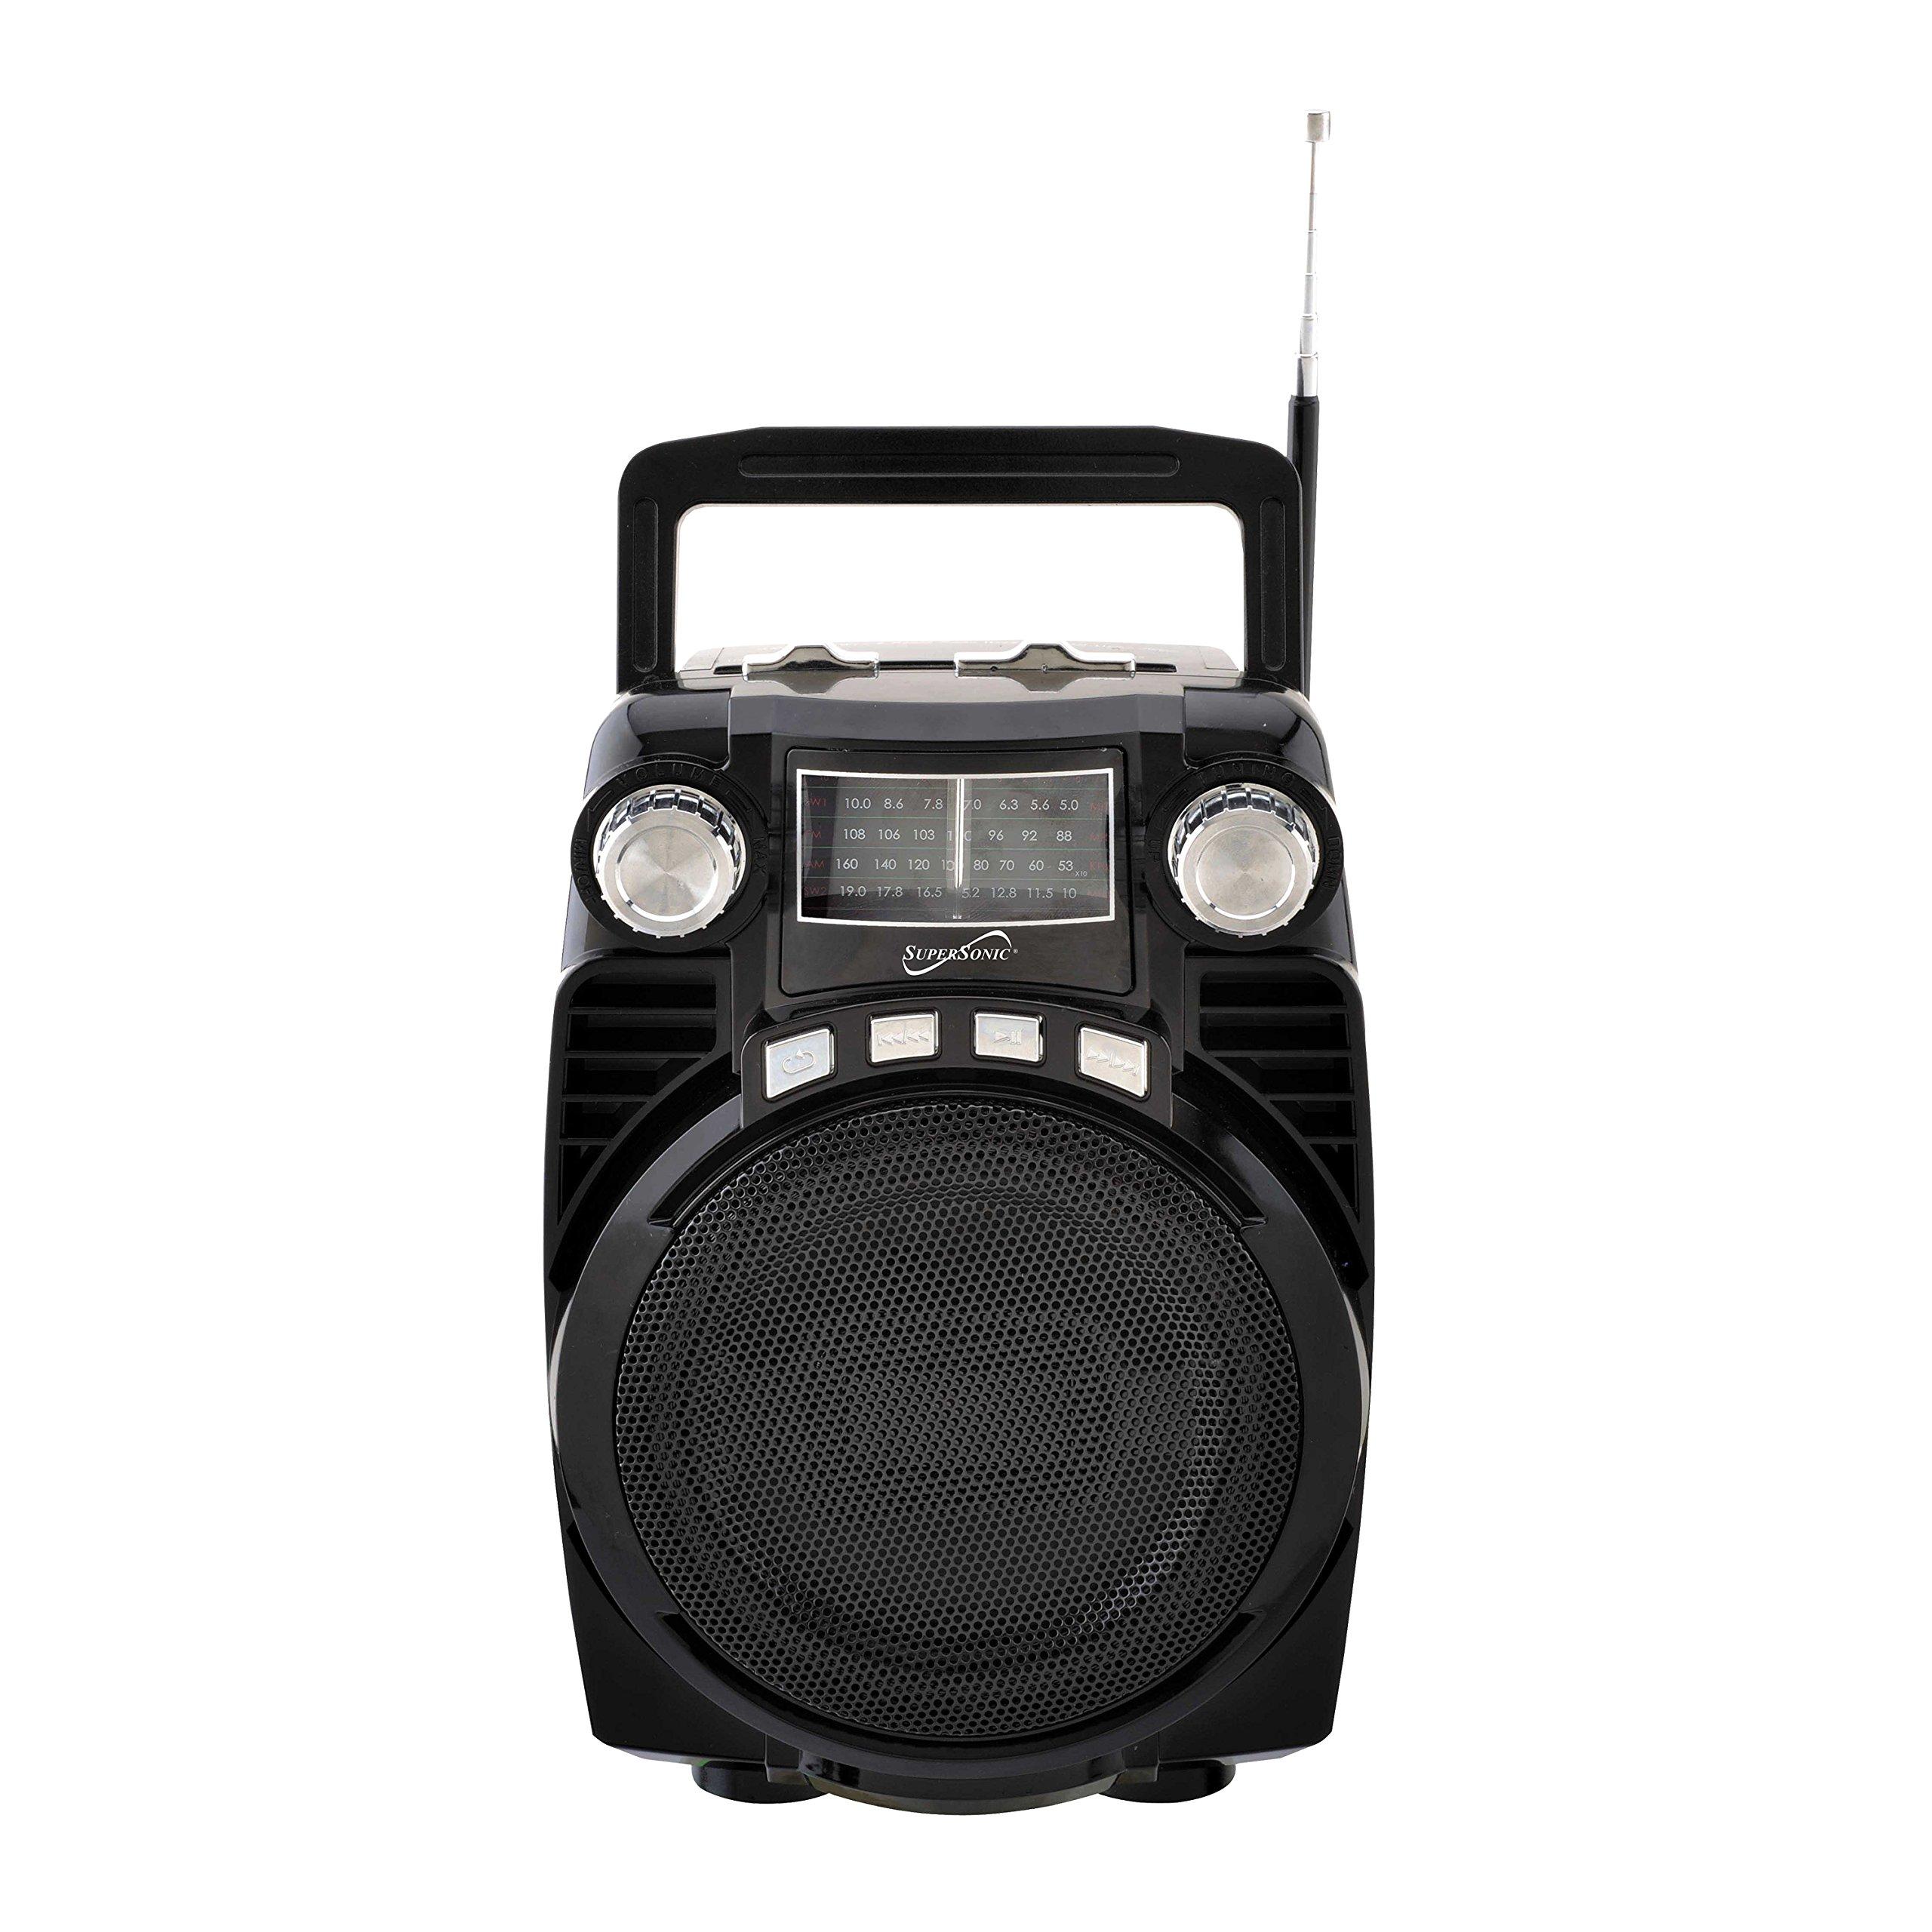 SuperSonic Bluetooth Portable 4 Band Radio, Black (SC-1390BT)